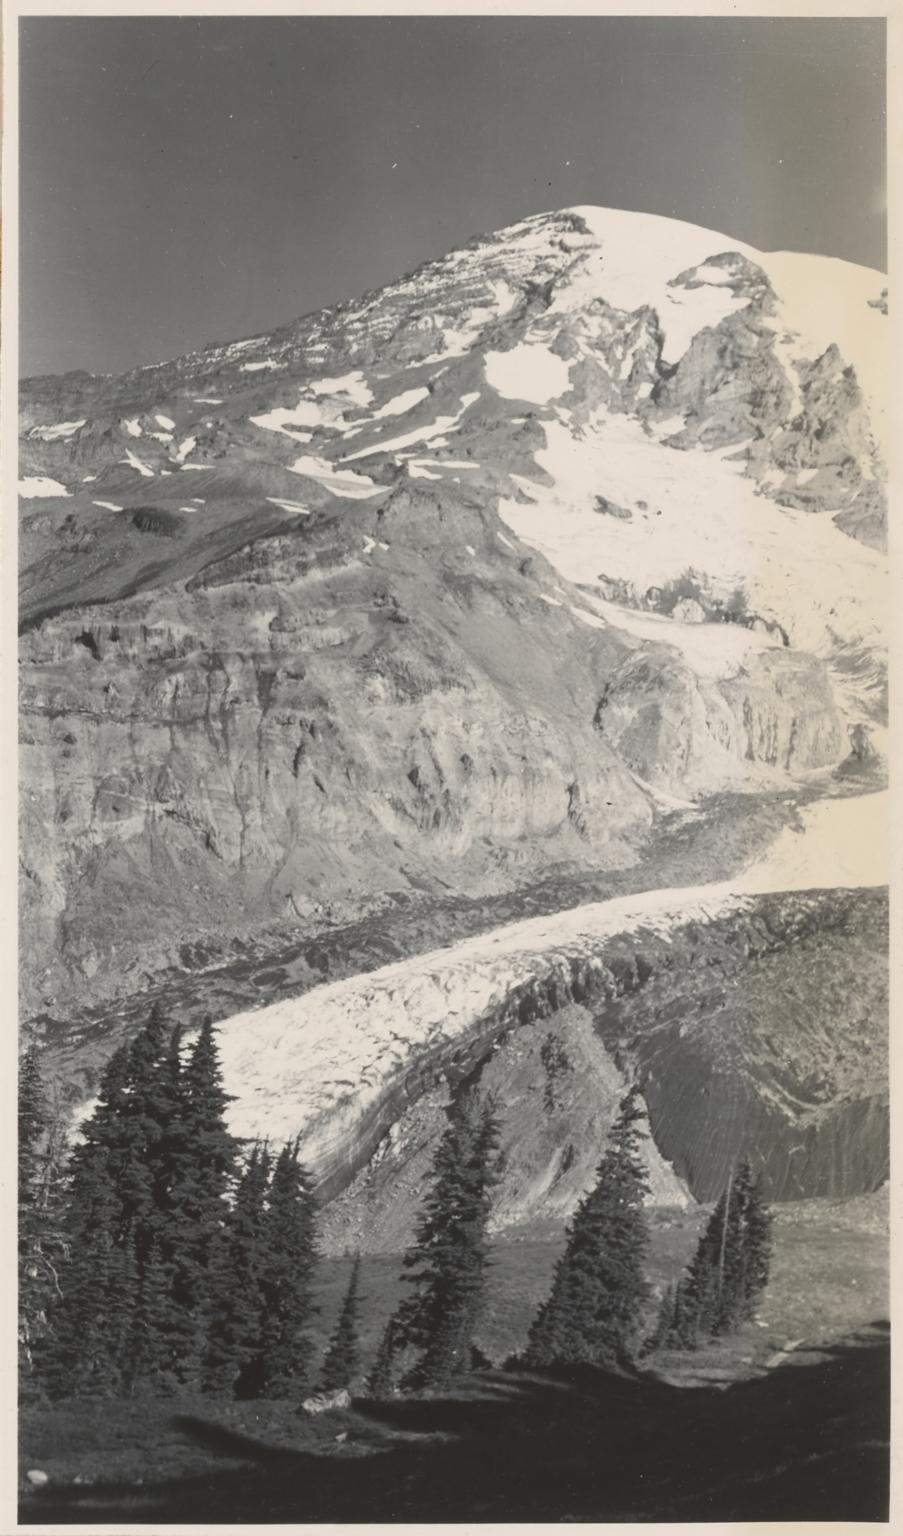 Nisqually Glacier, Washington